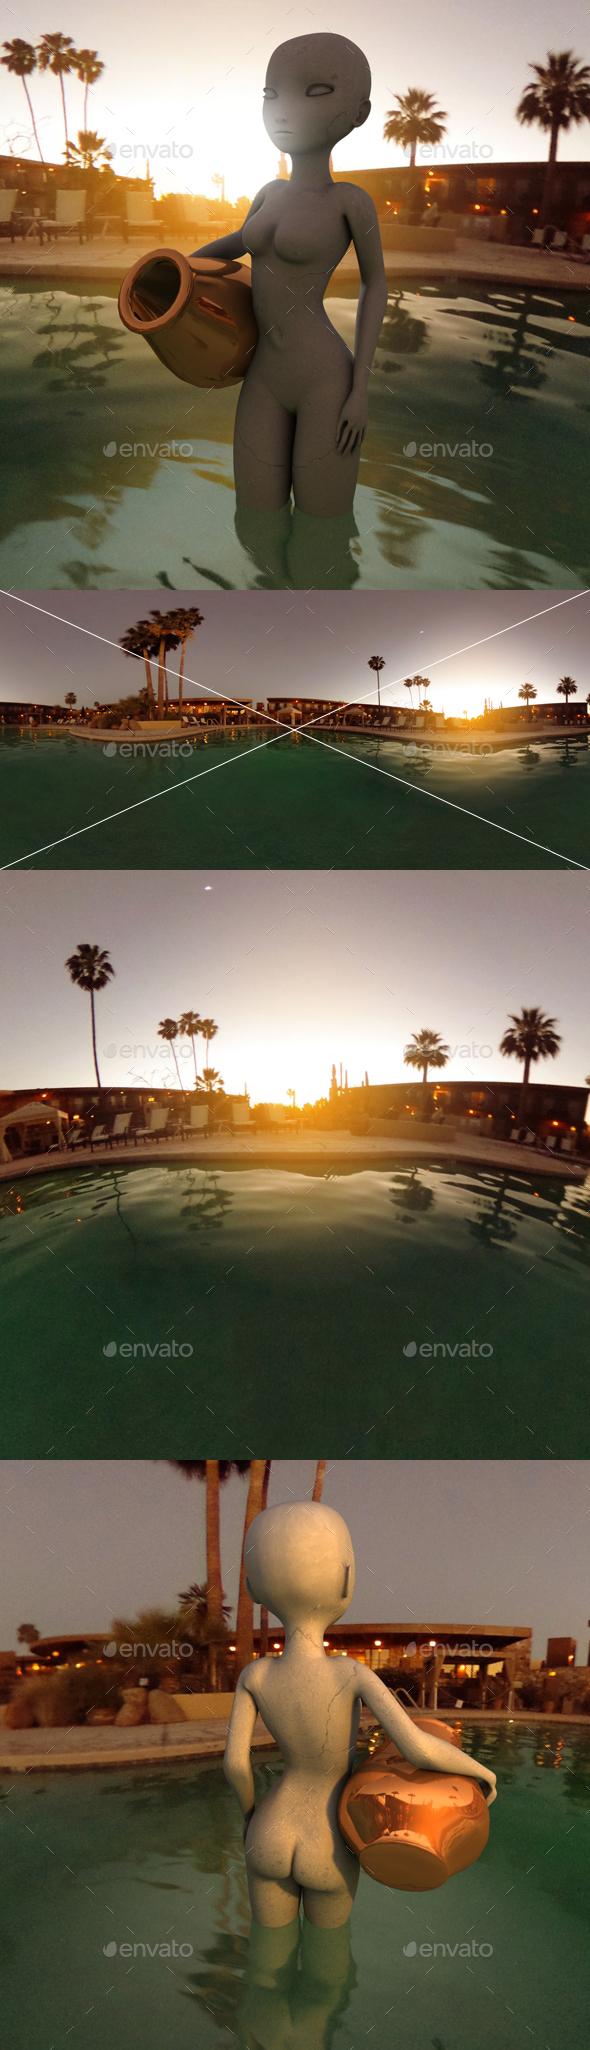 Dusk Hotel Pool HDRI - 3DOcean Item for Sale